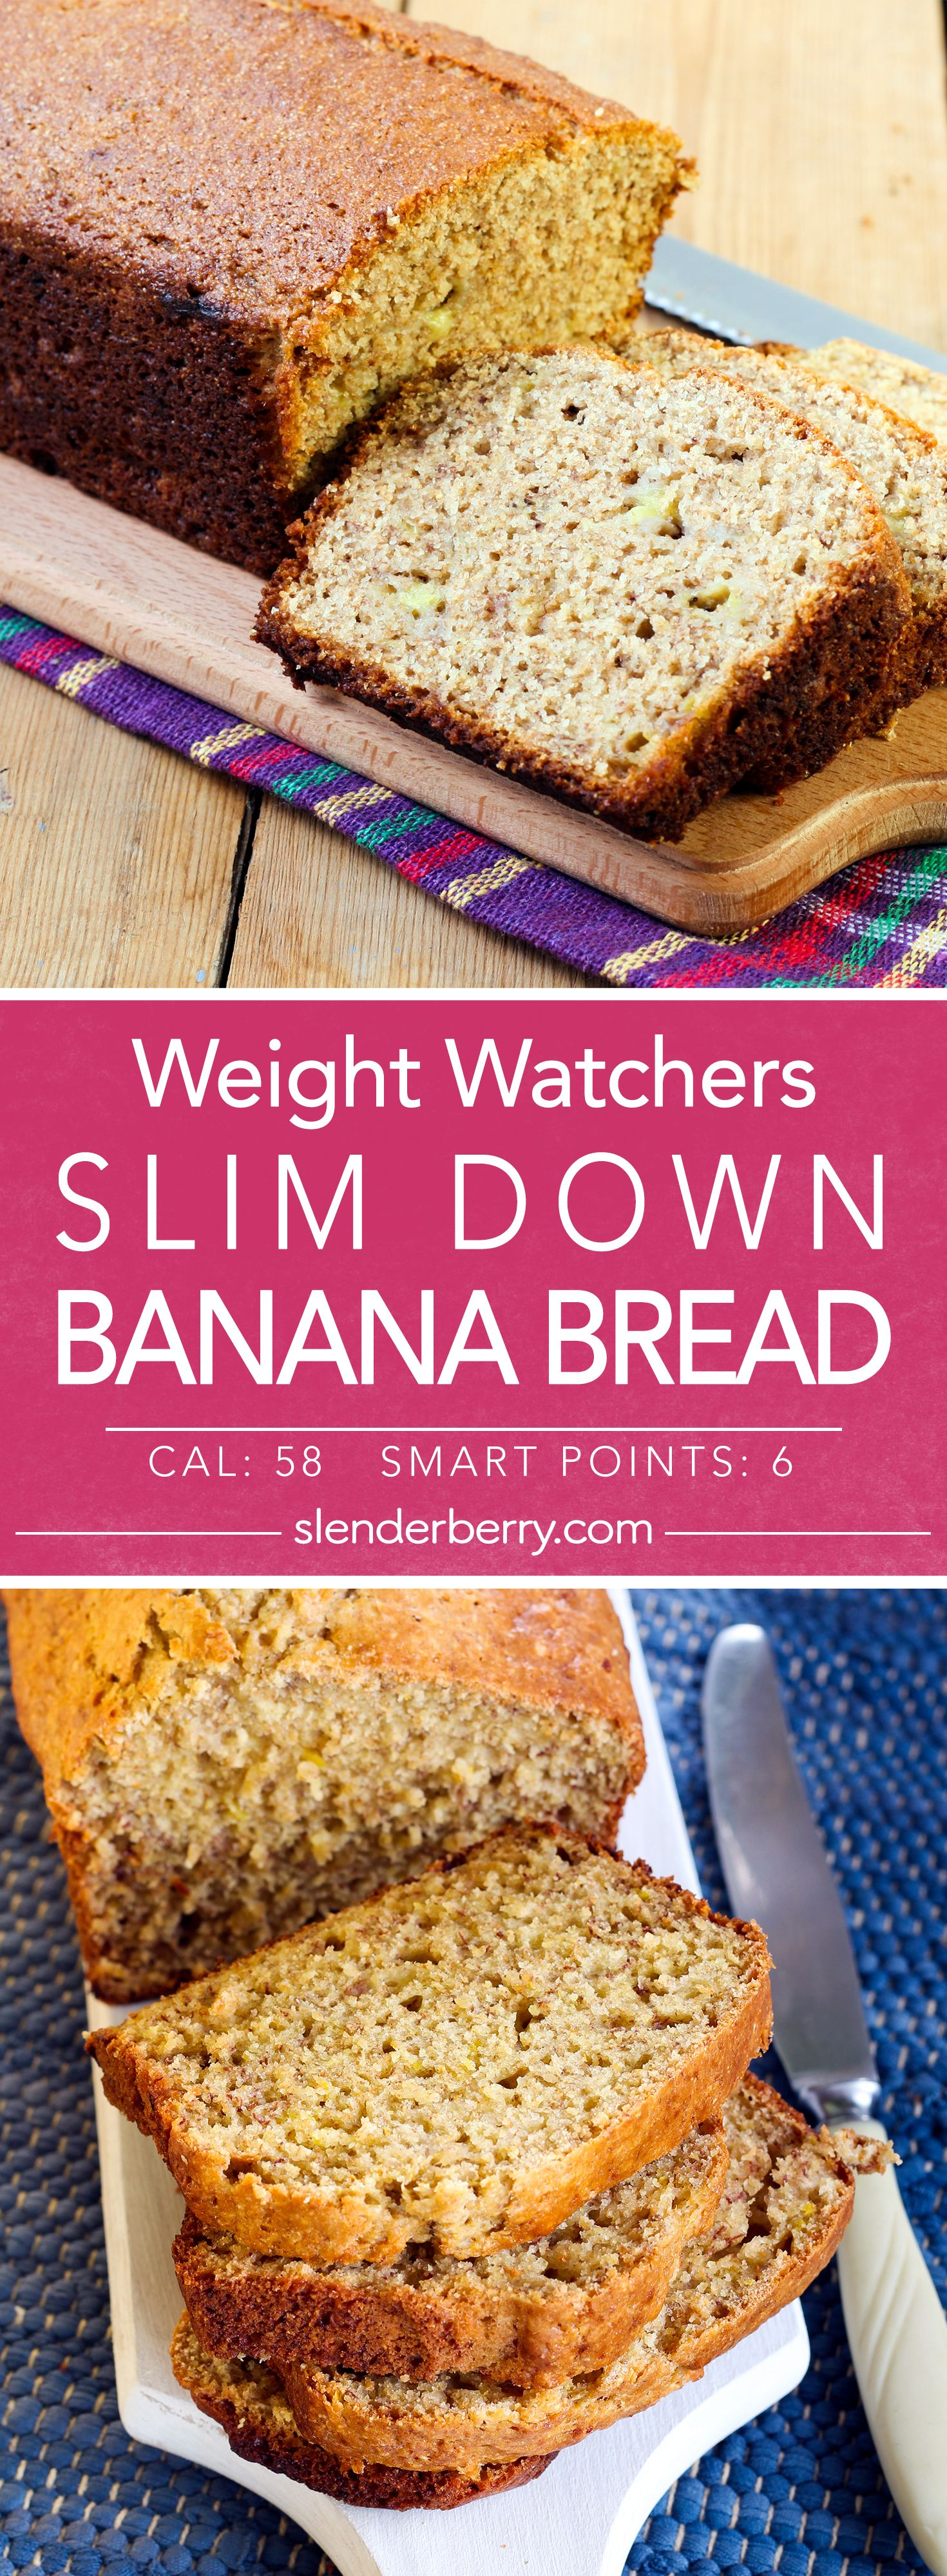 Slim Down Banana Bread #bananabreadrecipe